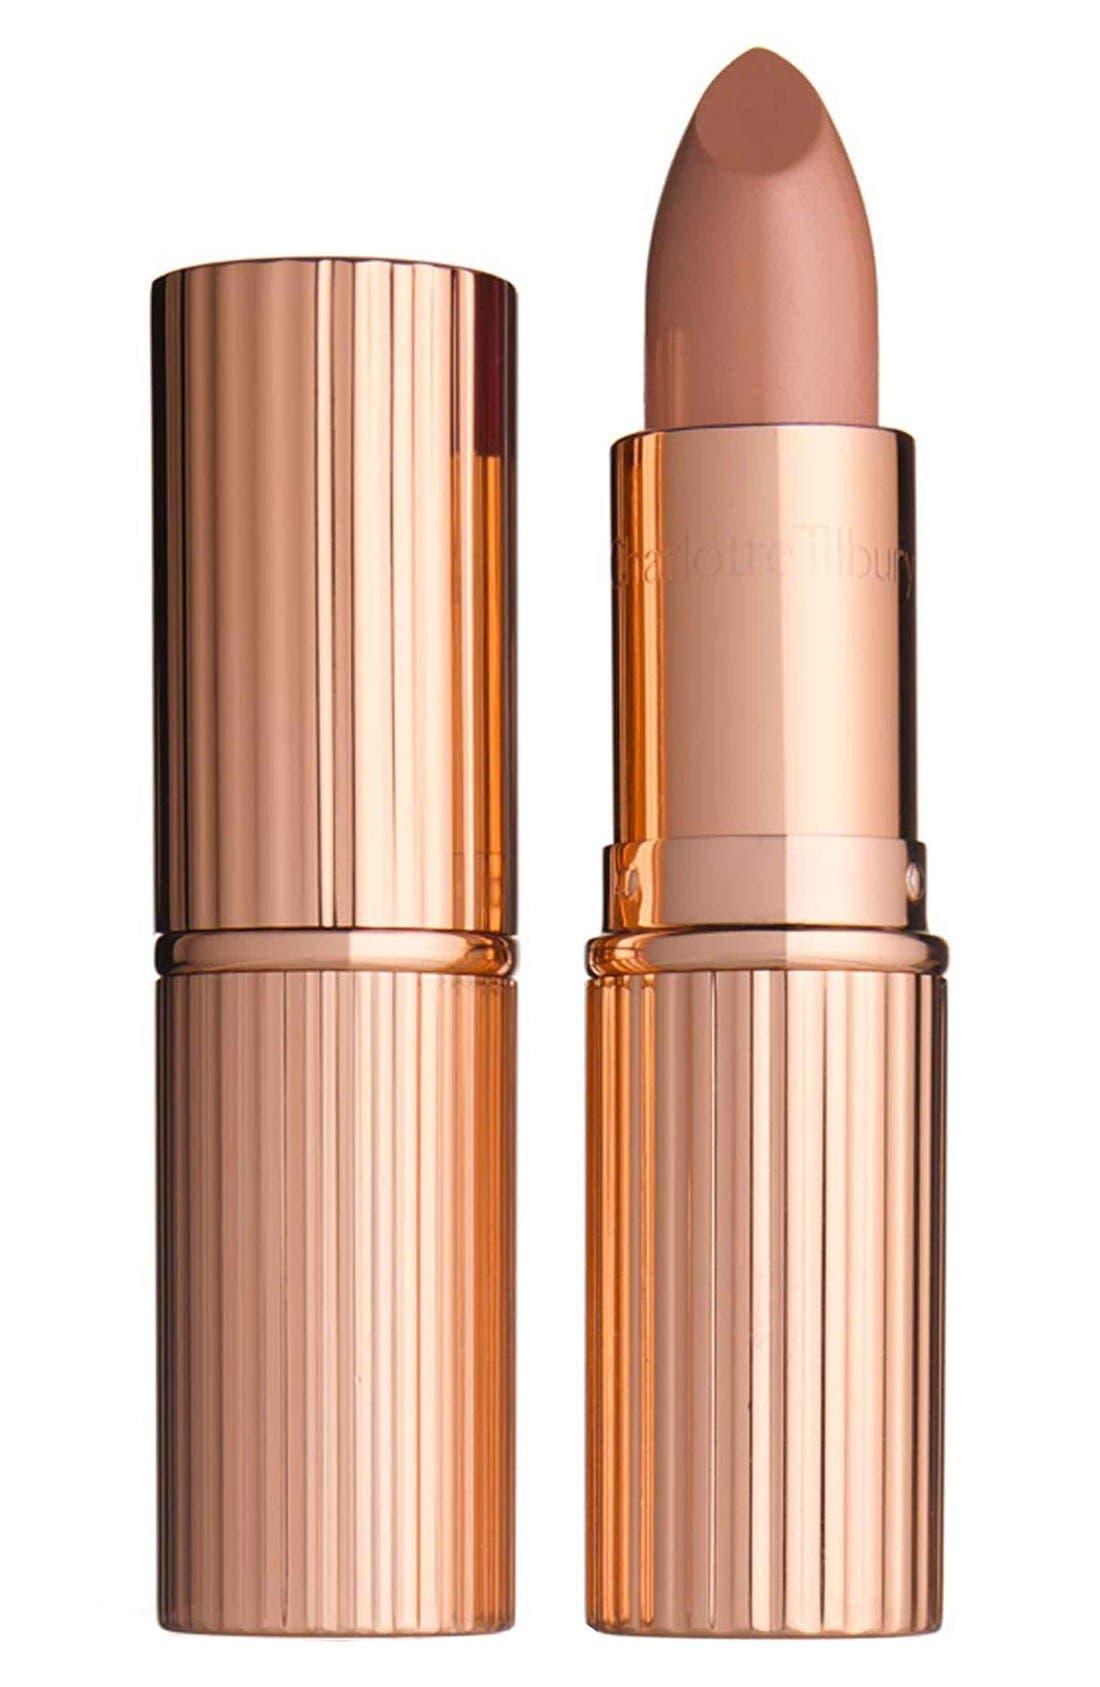 K.I.S.S.I.N.G Lipstick,                             Main thumbnail 1, color,                             HEPBURN HONEY